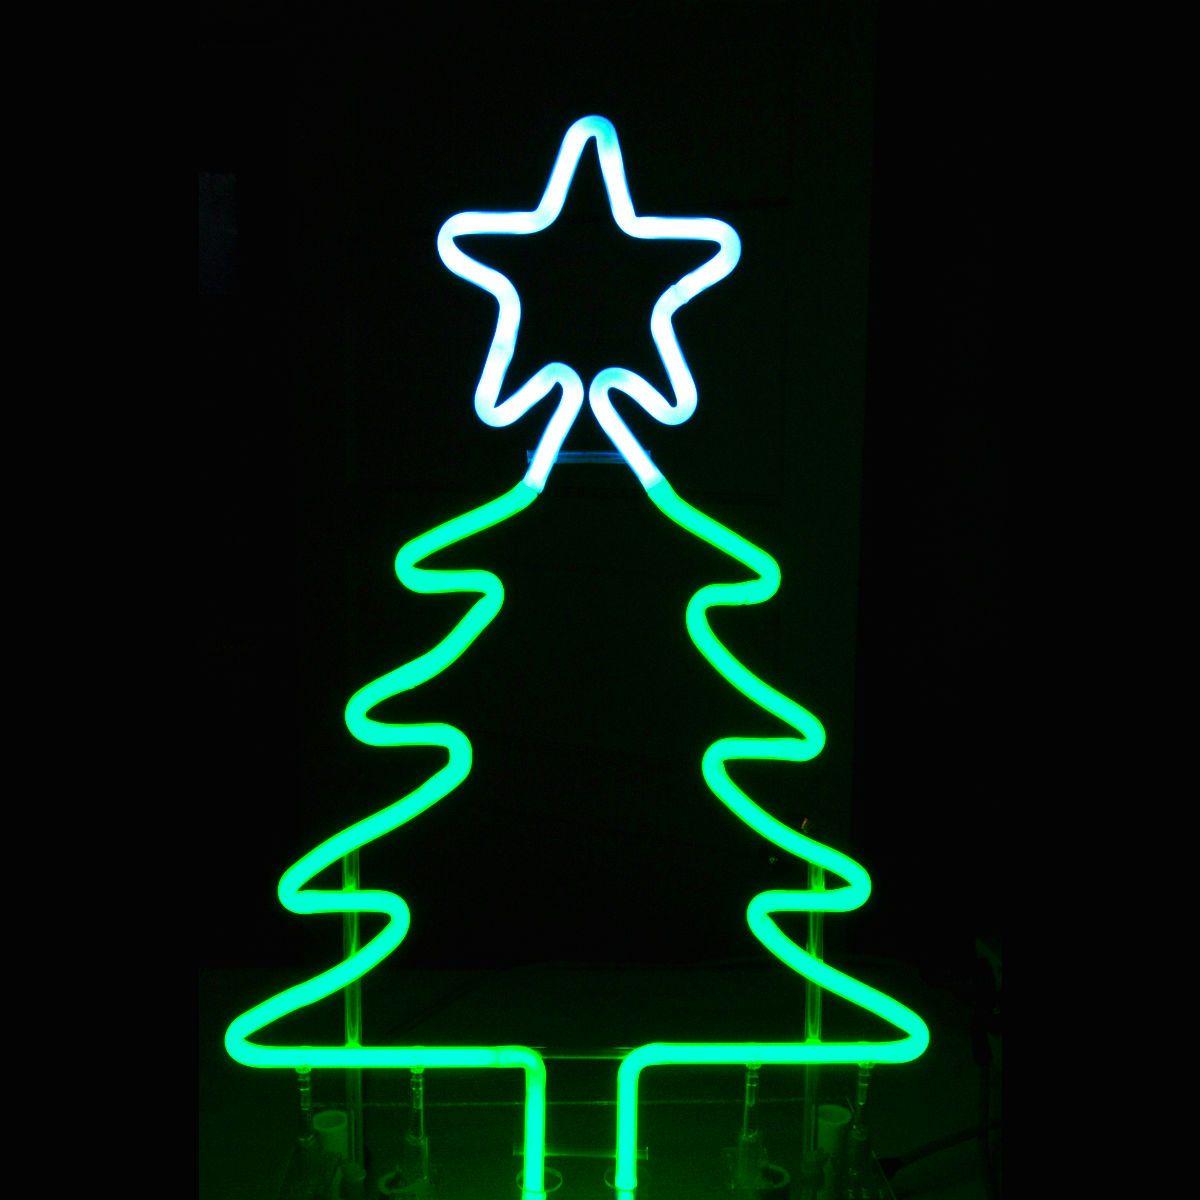 Merry Christmas Christmas Phone Wallpaper Neon Christmas Tree Art